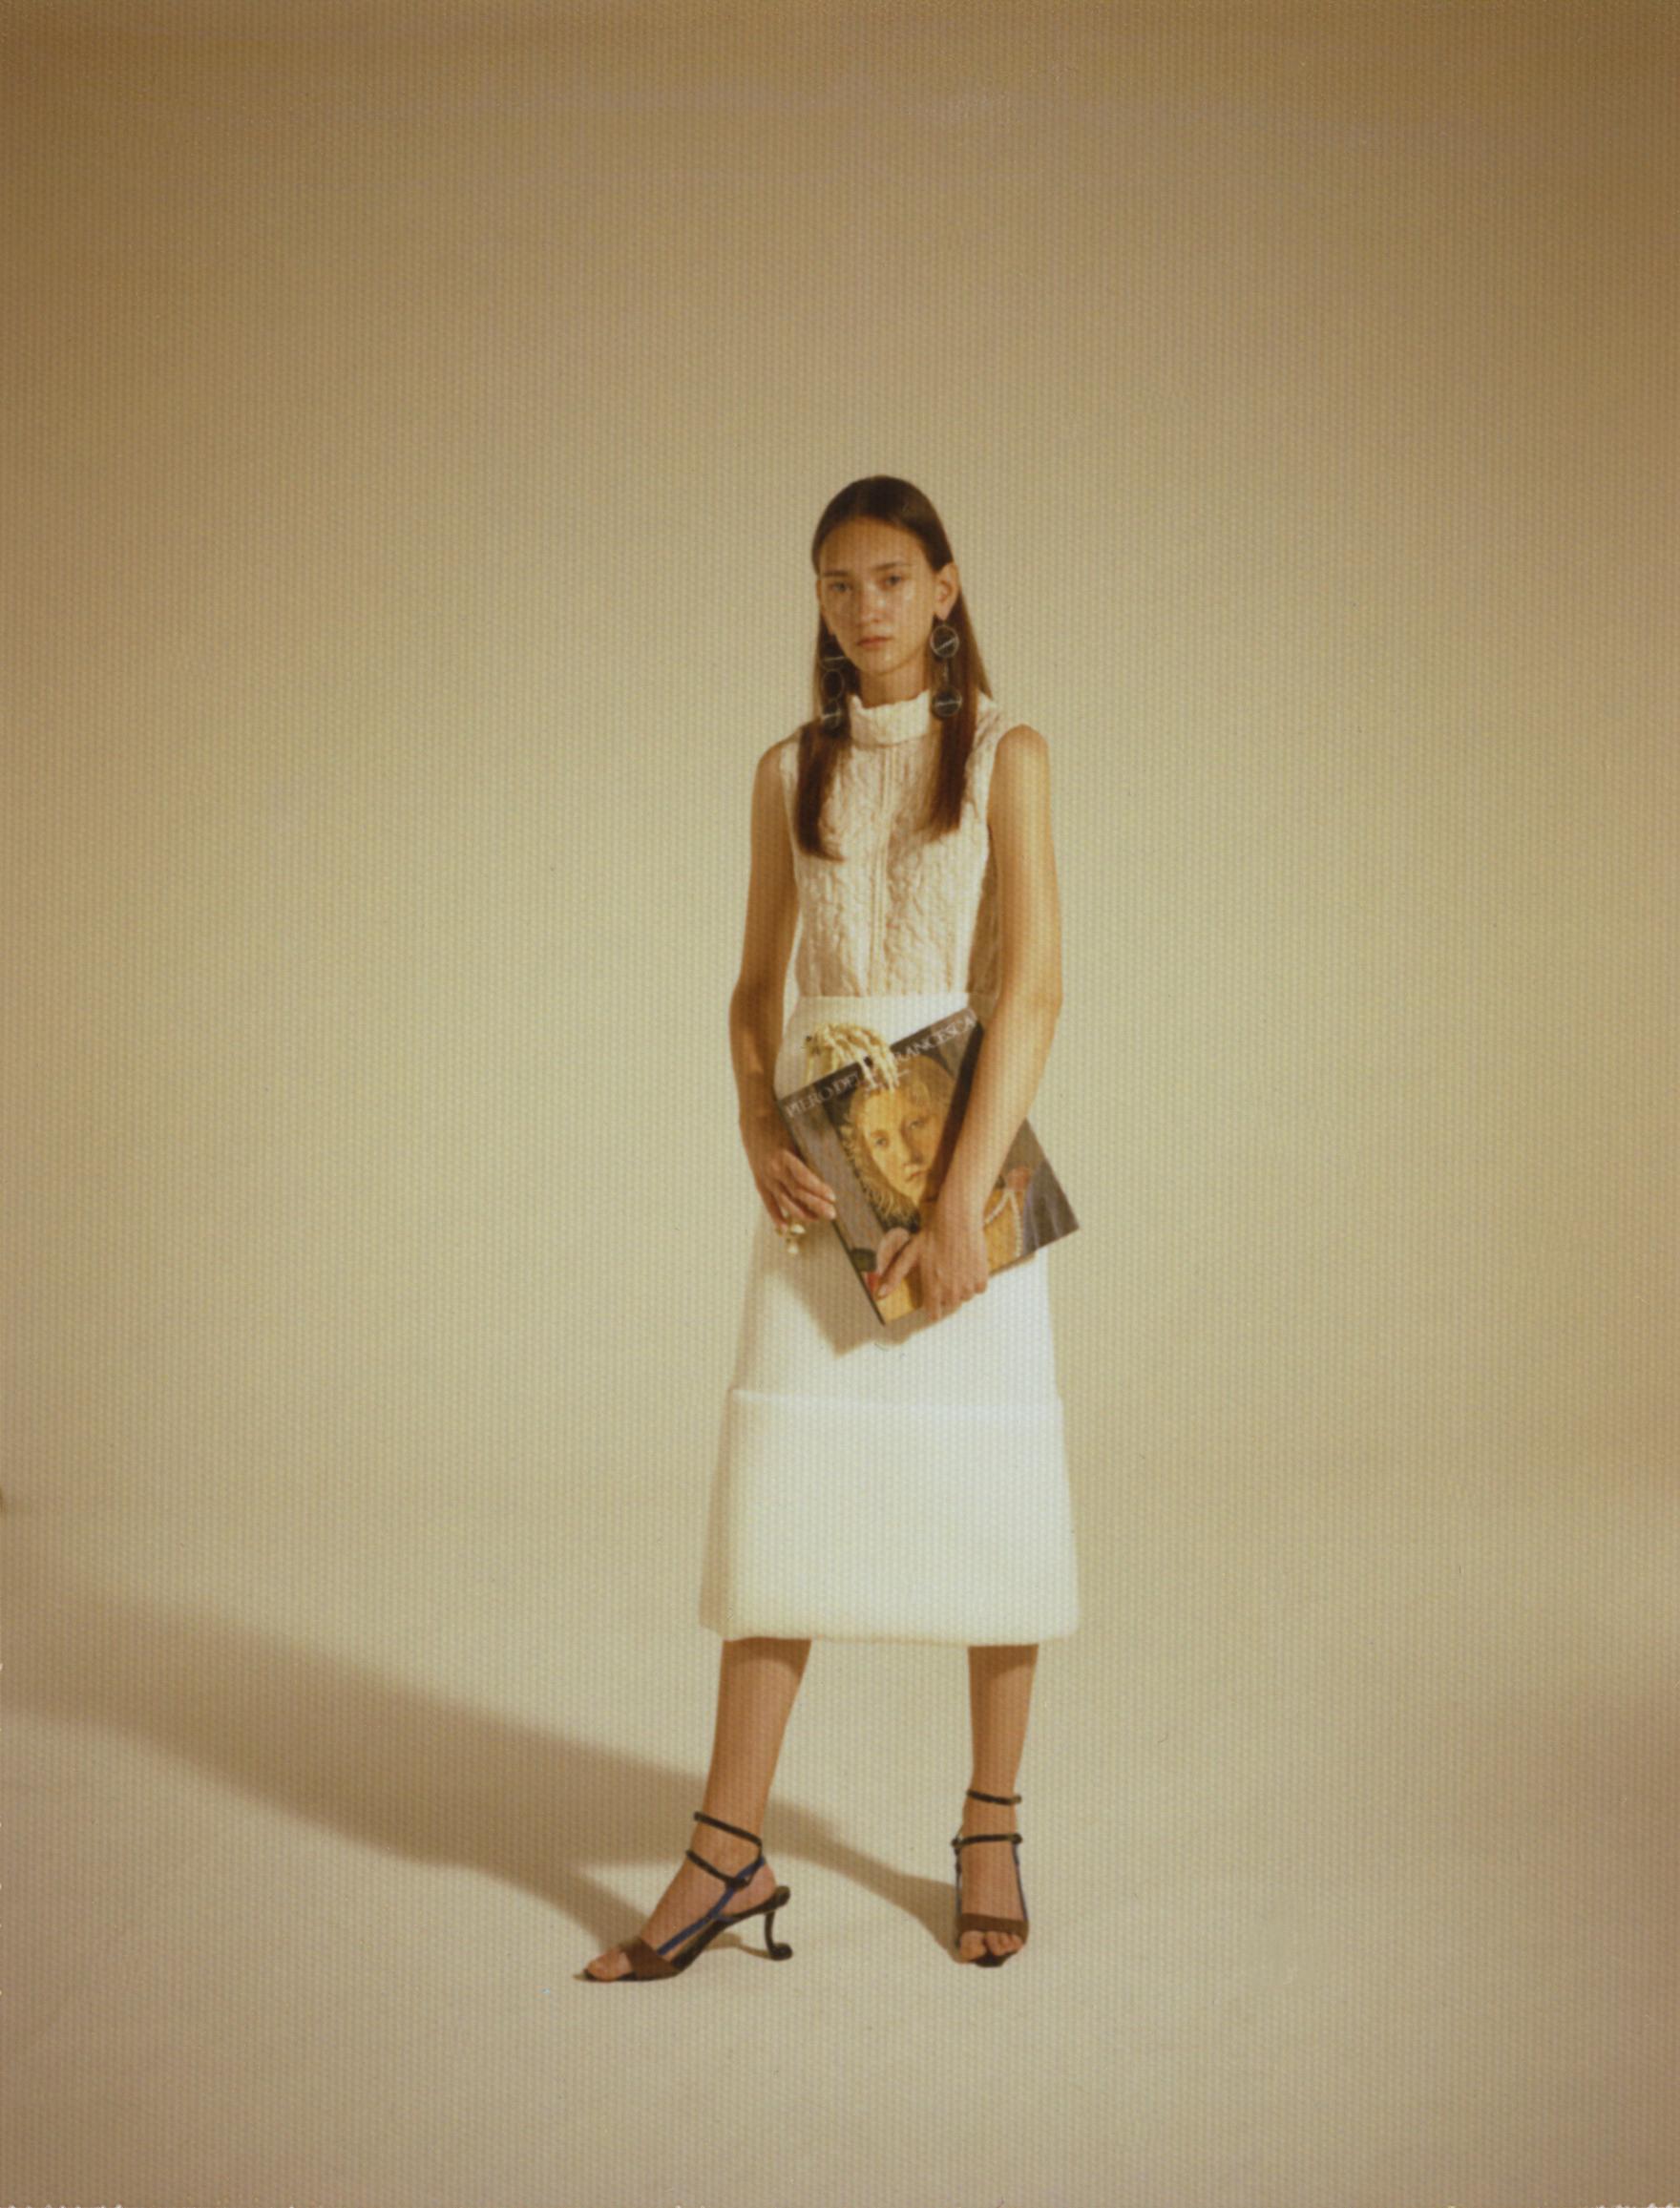 transparent earrings and yellow plain polyester top  MARNI white wool midi skirt  JIL SANDER multicolor plain leather sandals  MARNI